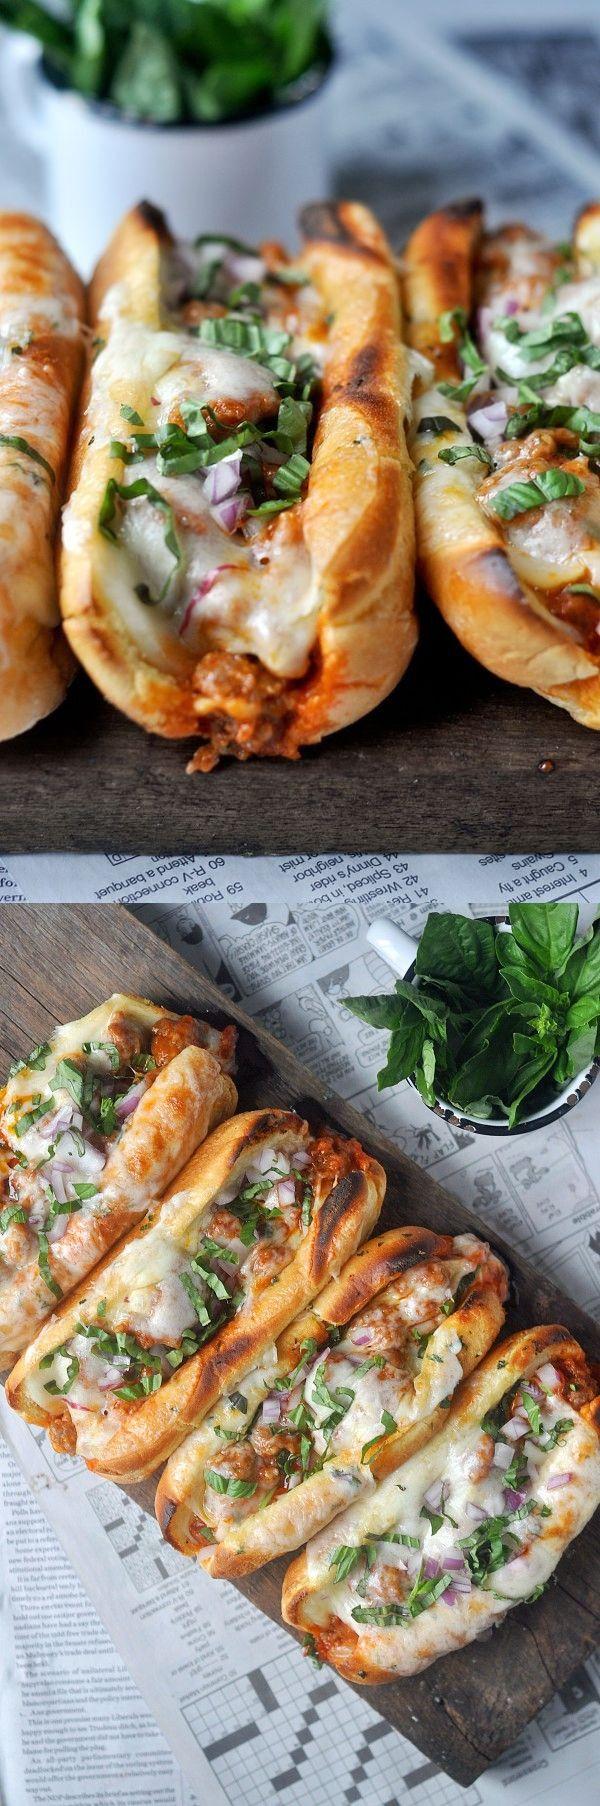 Garlic Butter Italian Sausage Sandwiches